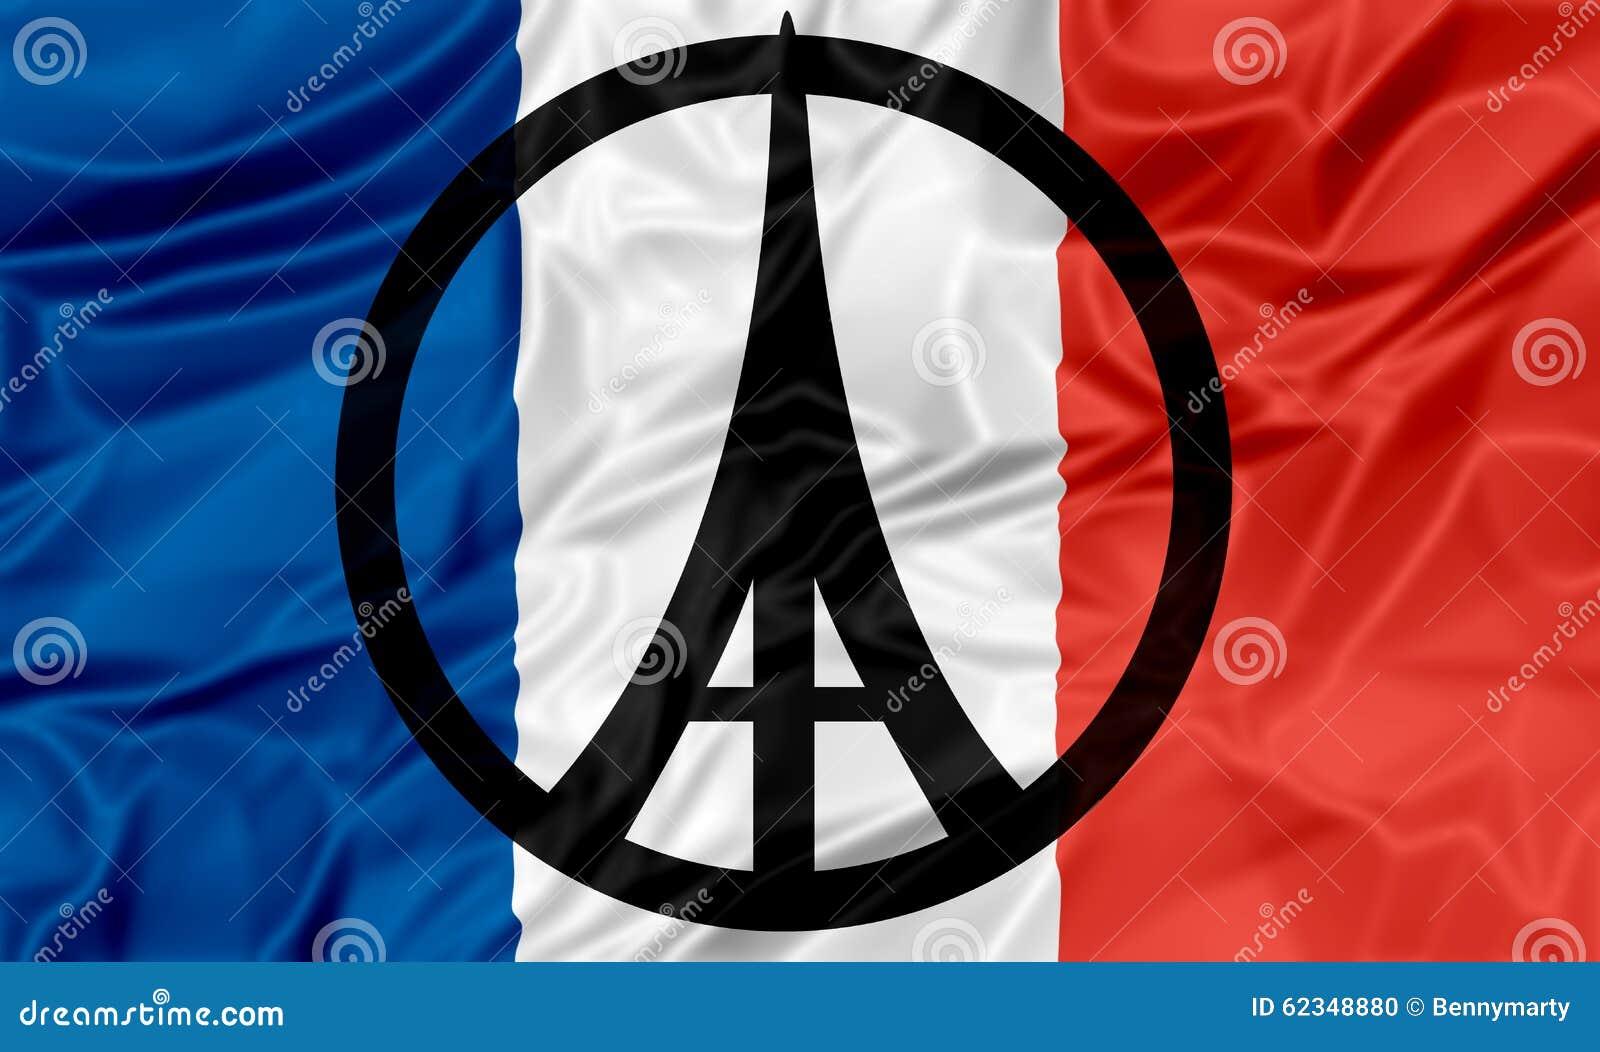 Paris peace flag stock illustration image of military 62348880 paris peace flag biocorpaavc